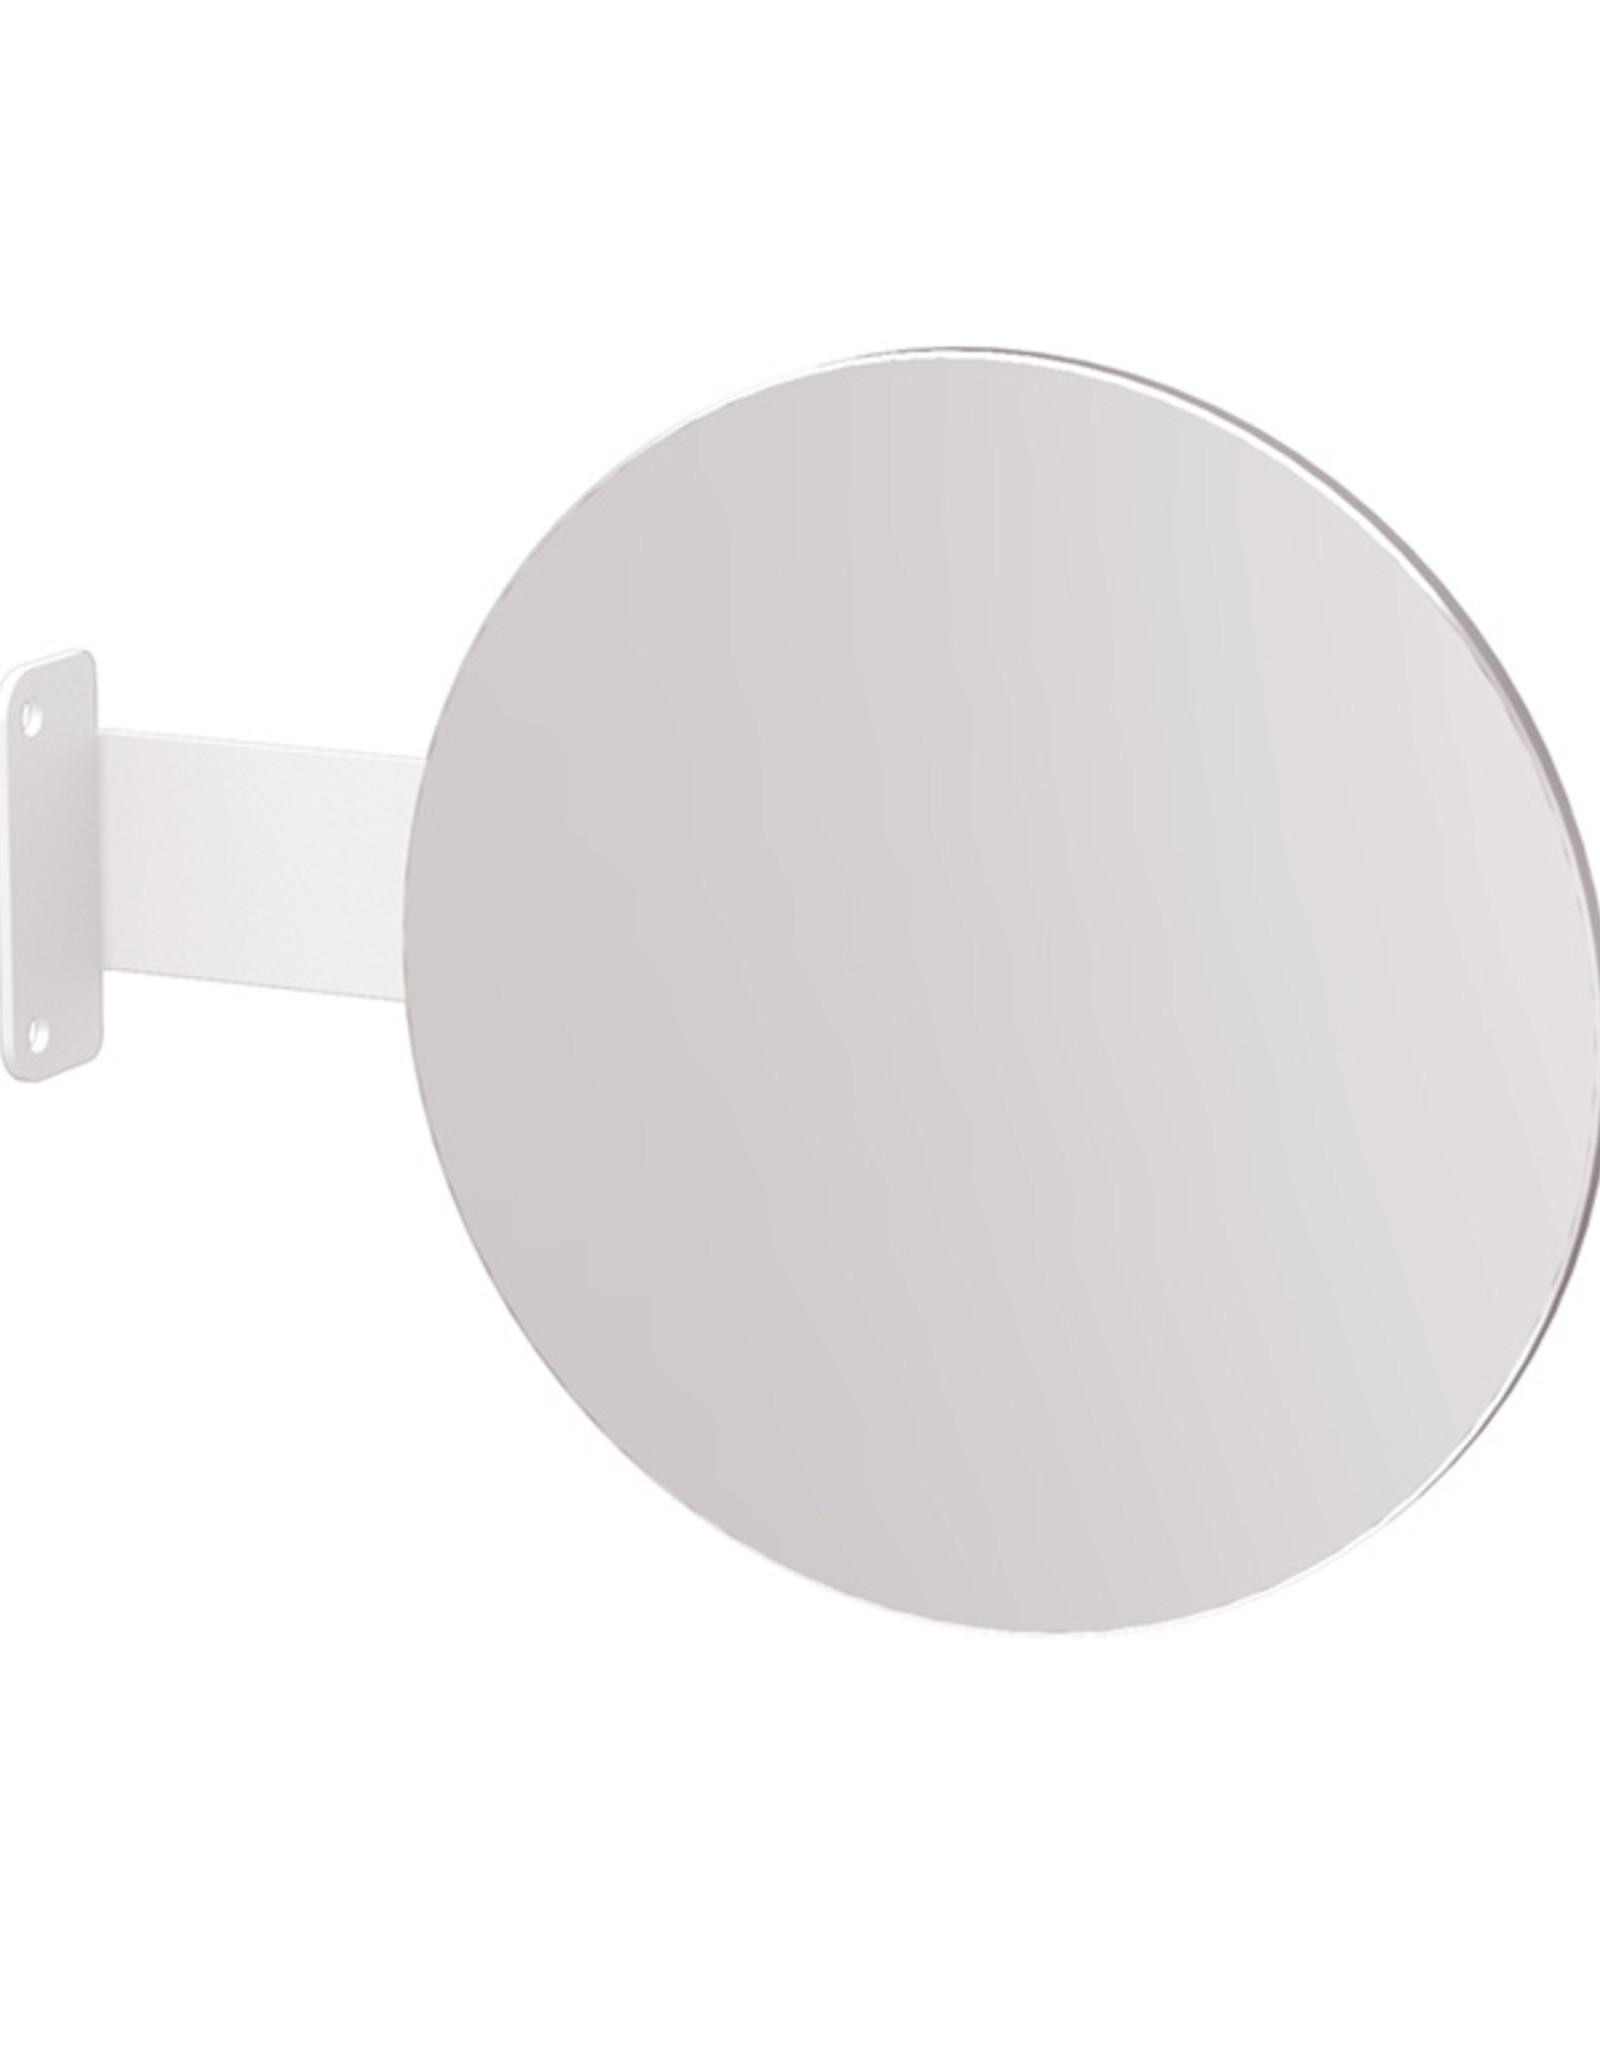 Gus* Modern Branch Side Mirror